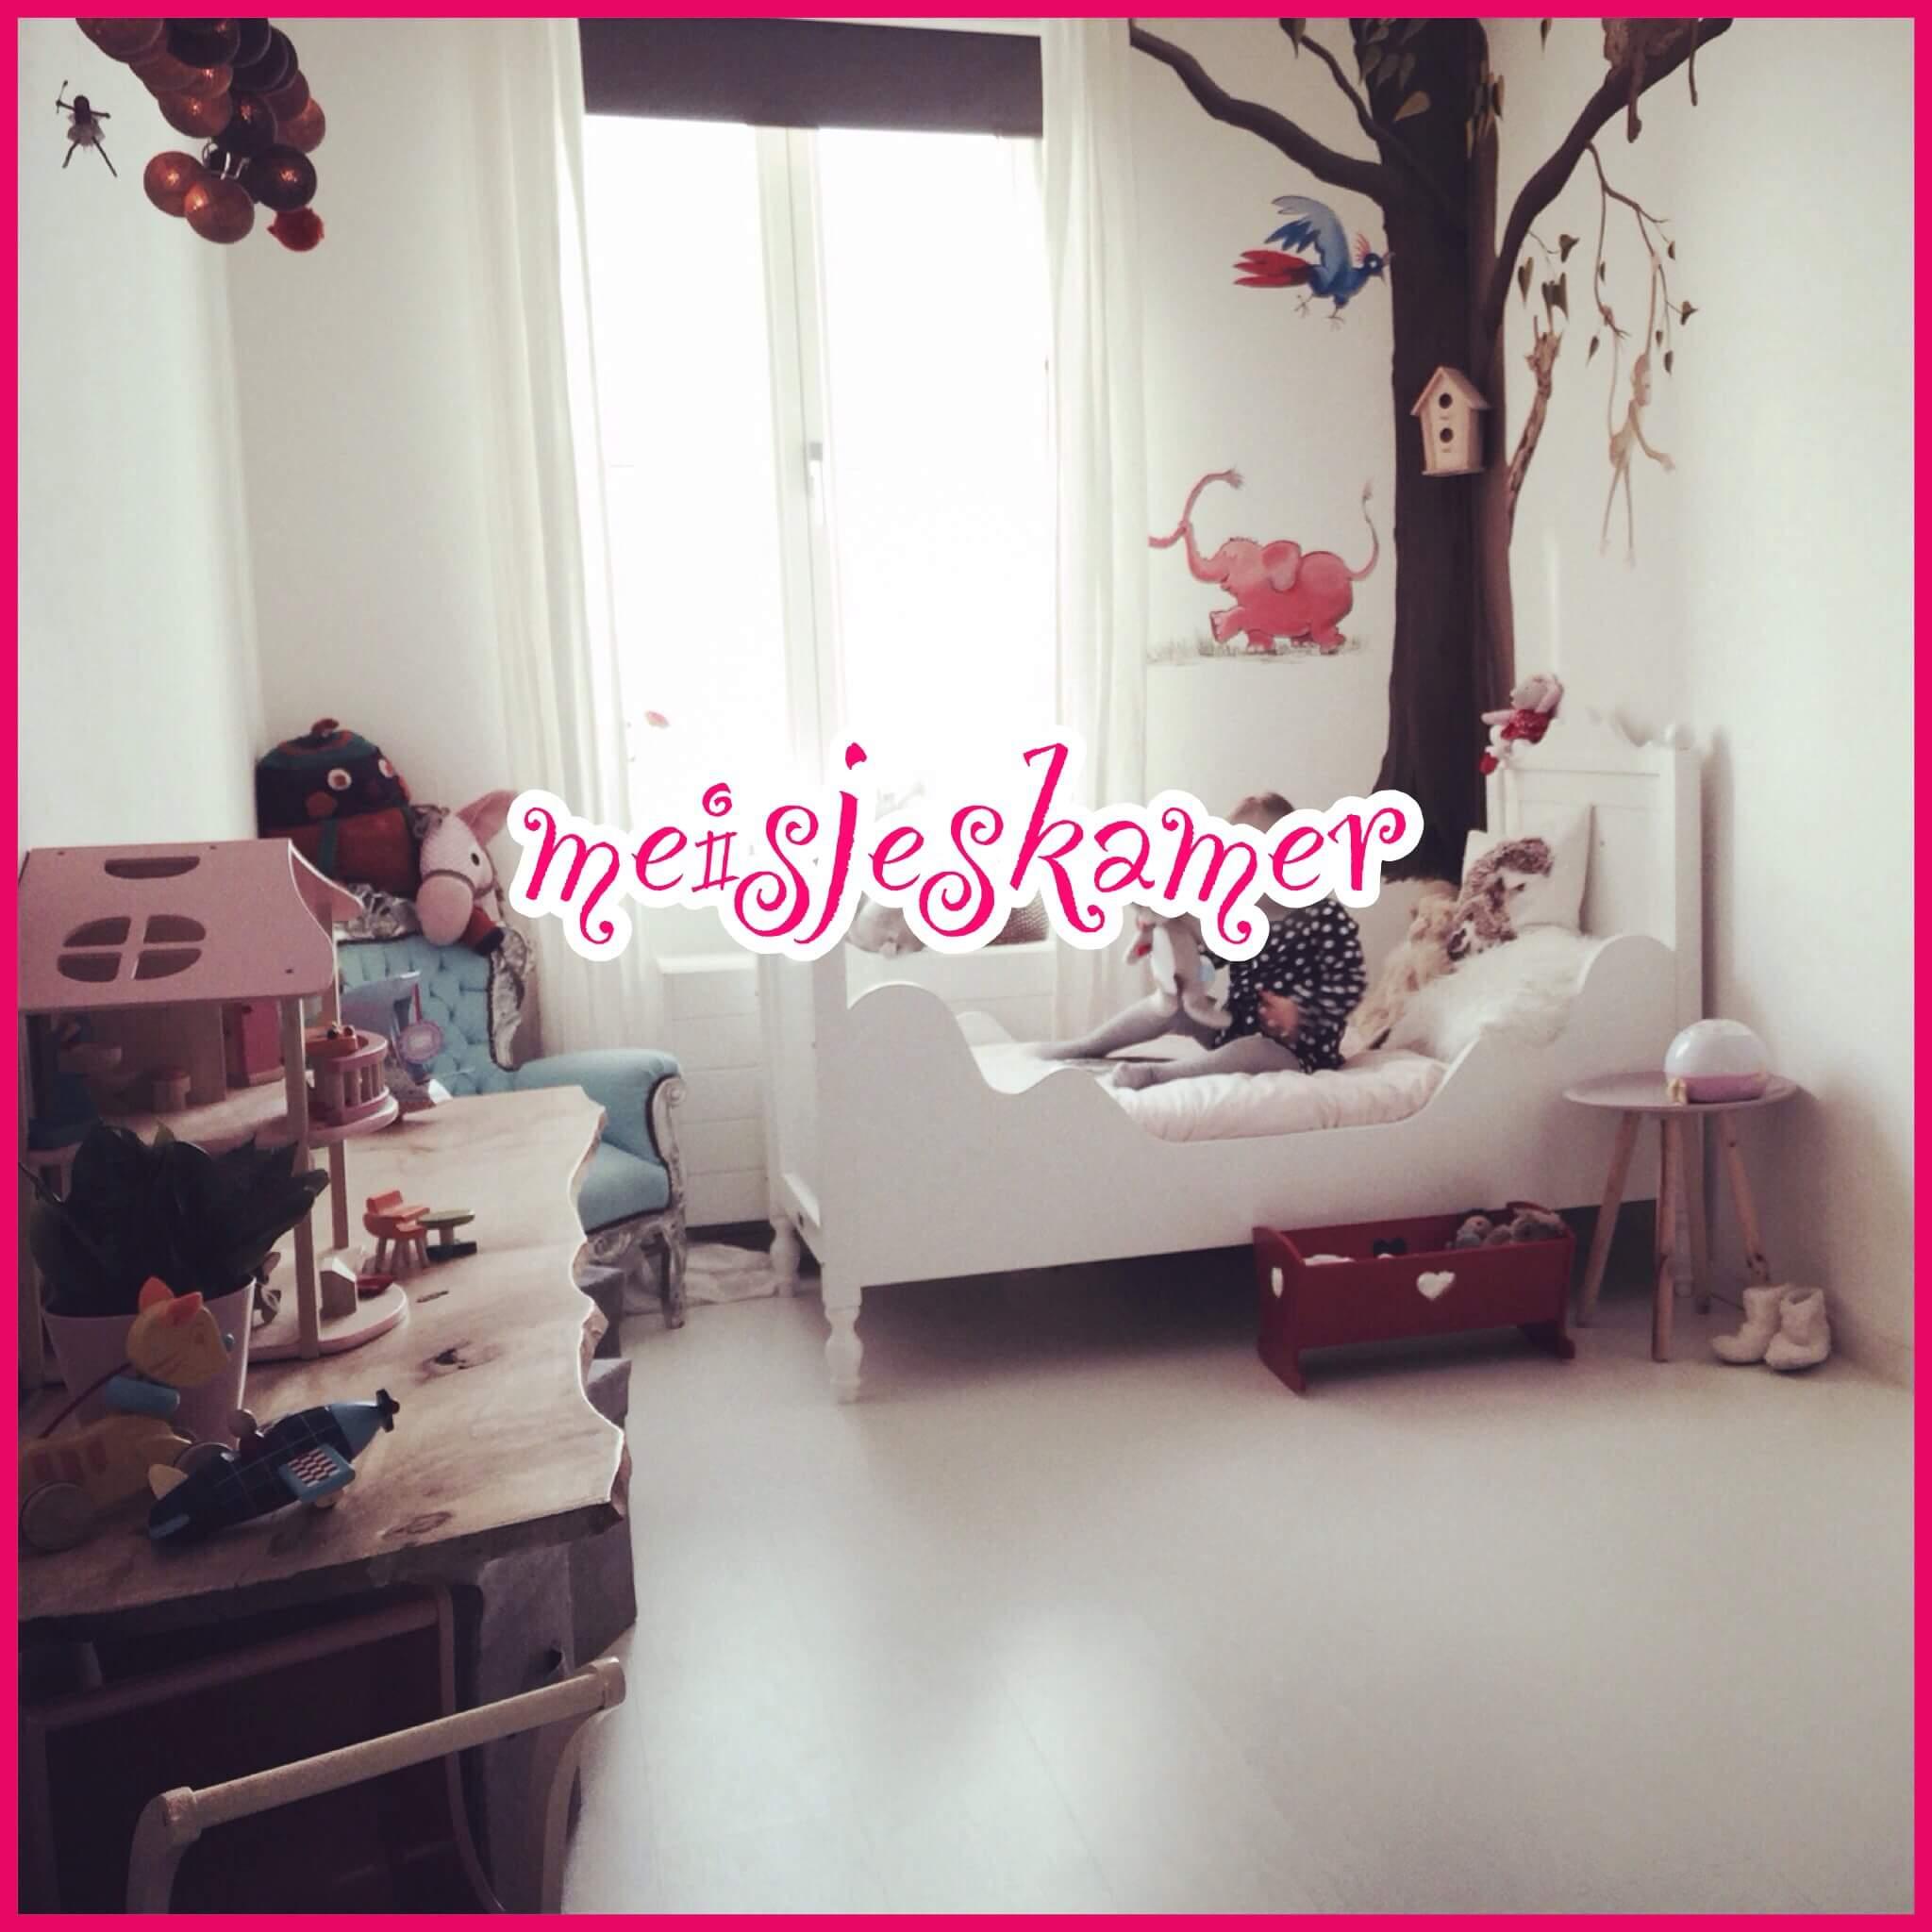 Houten Babykamer Accessoires: Diy, kinderkamer, zelf, maken ...